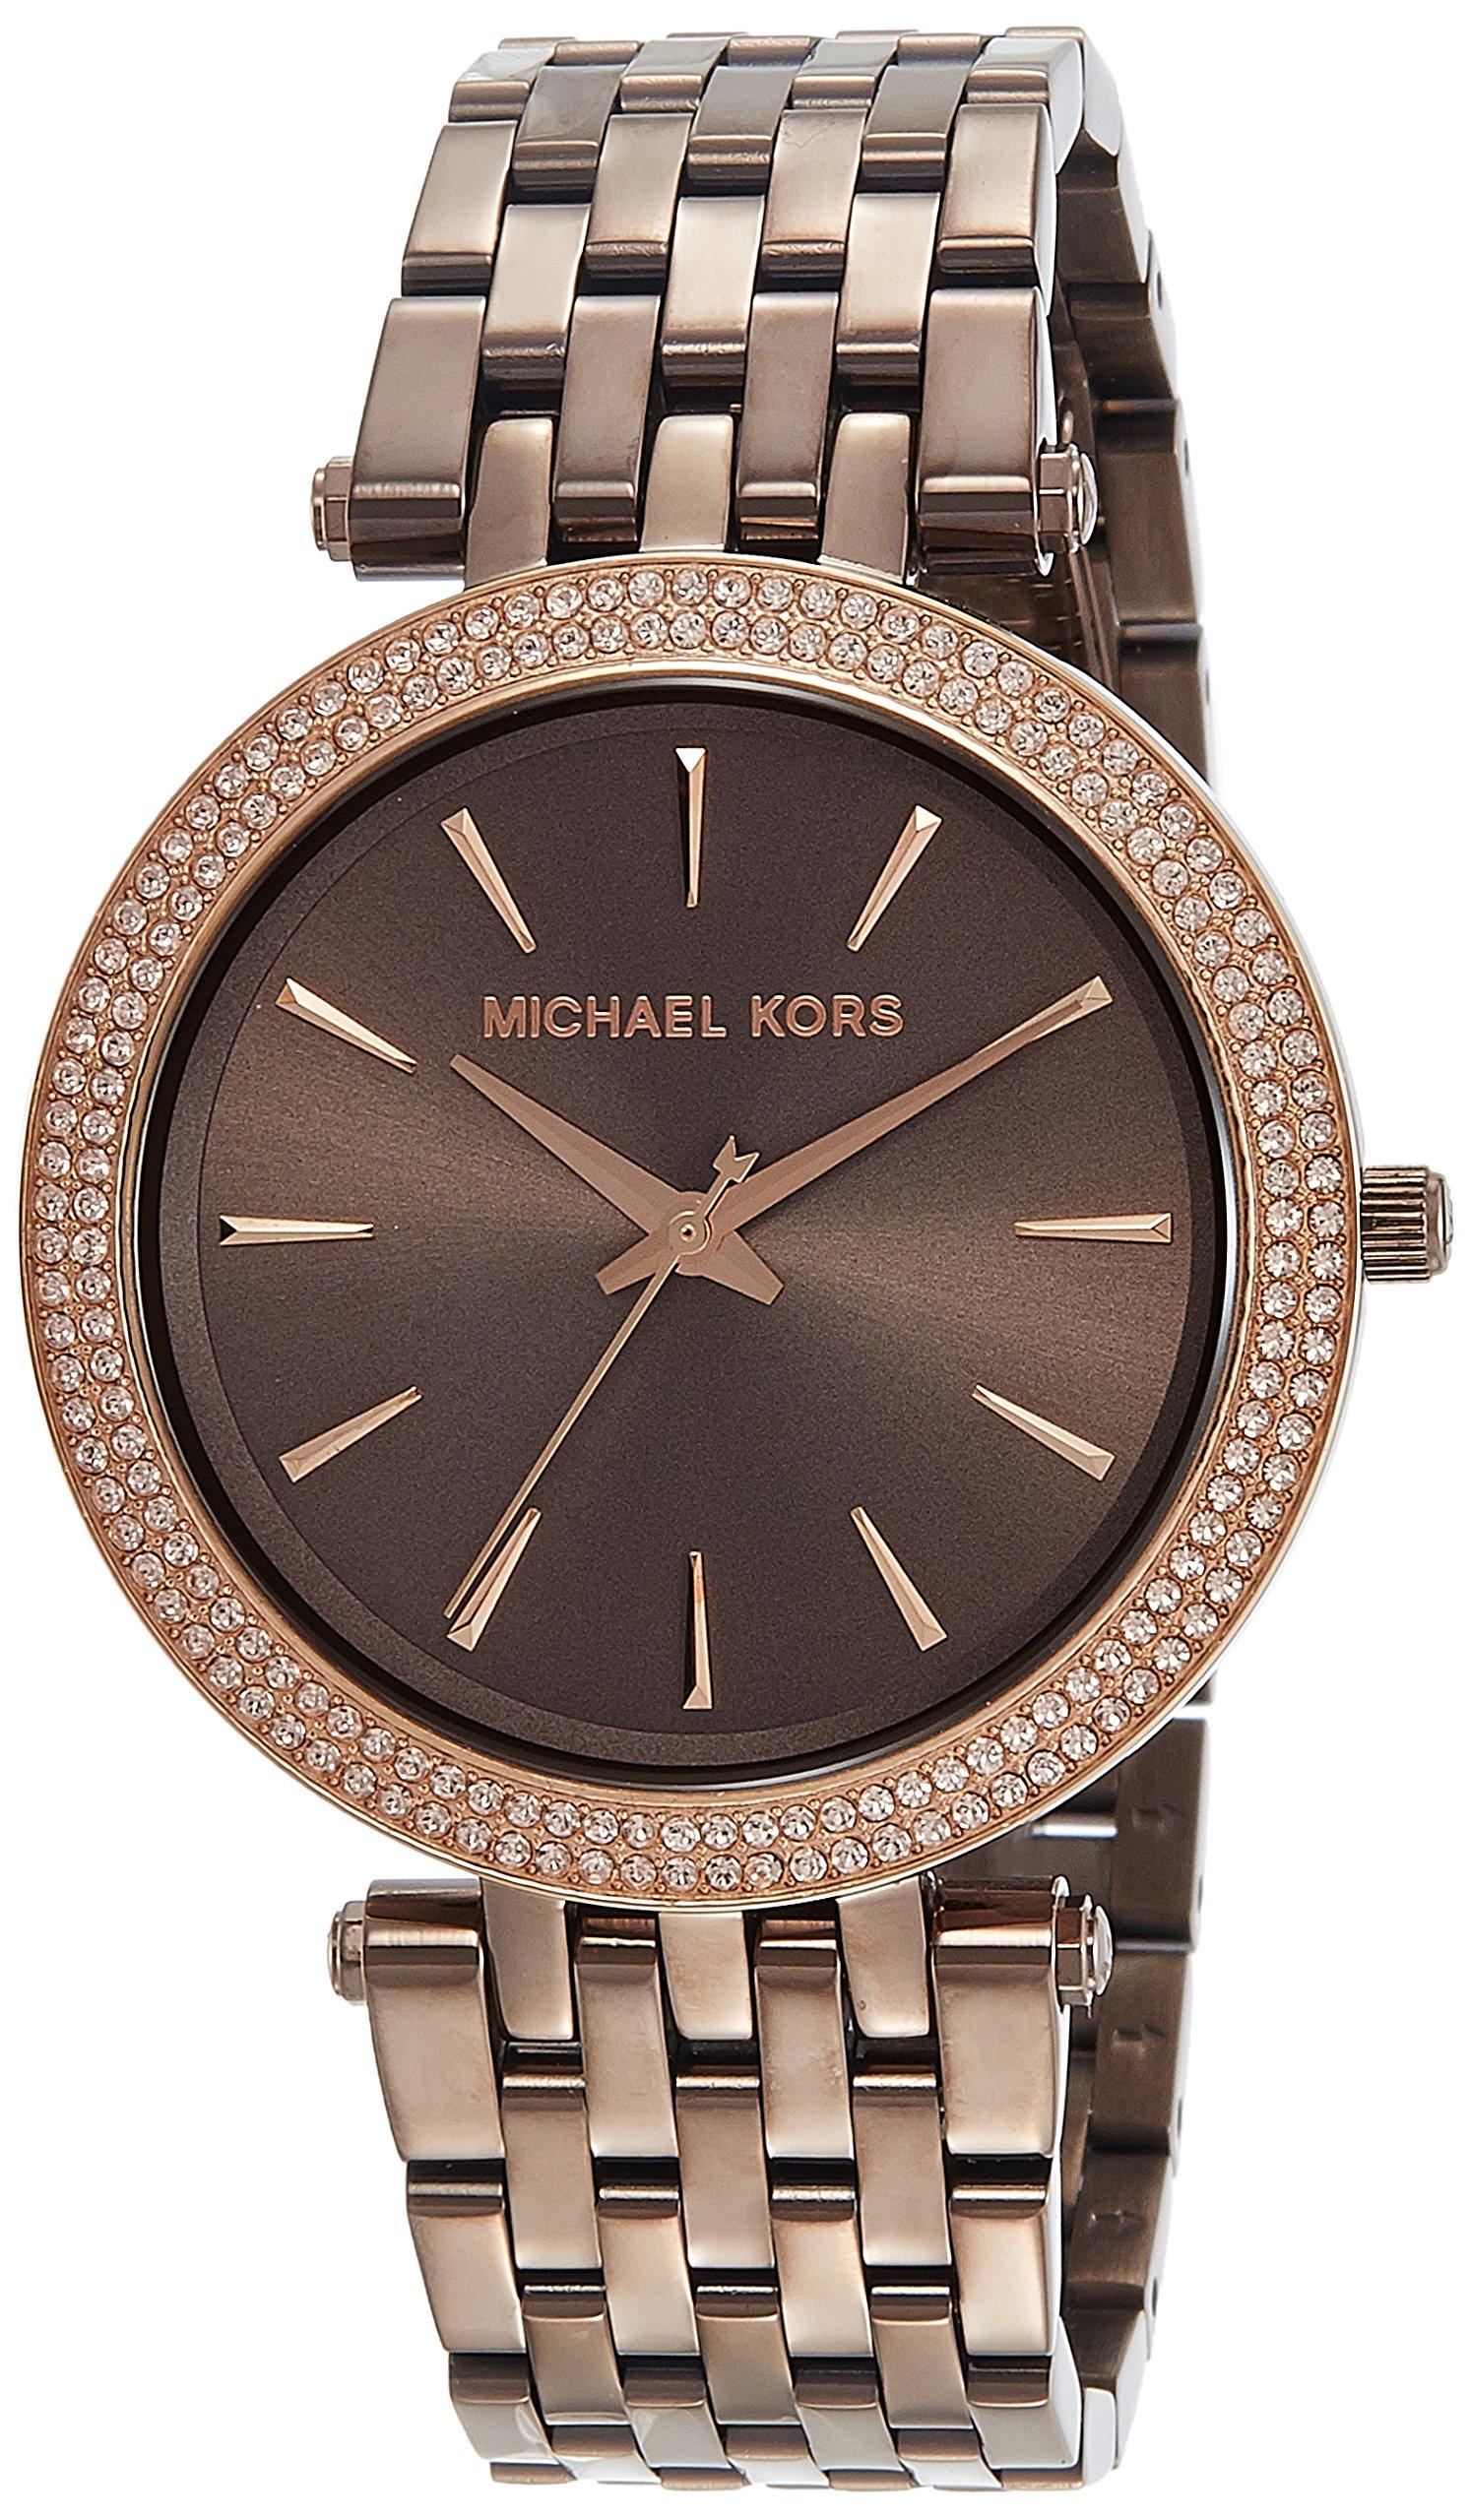 Michael Kors Women's Darci Brown Watch MK3416